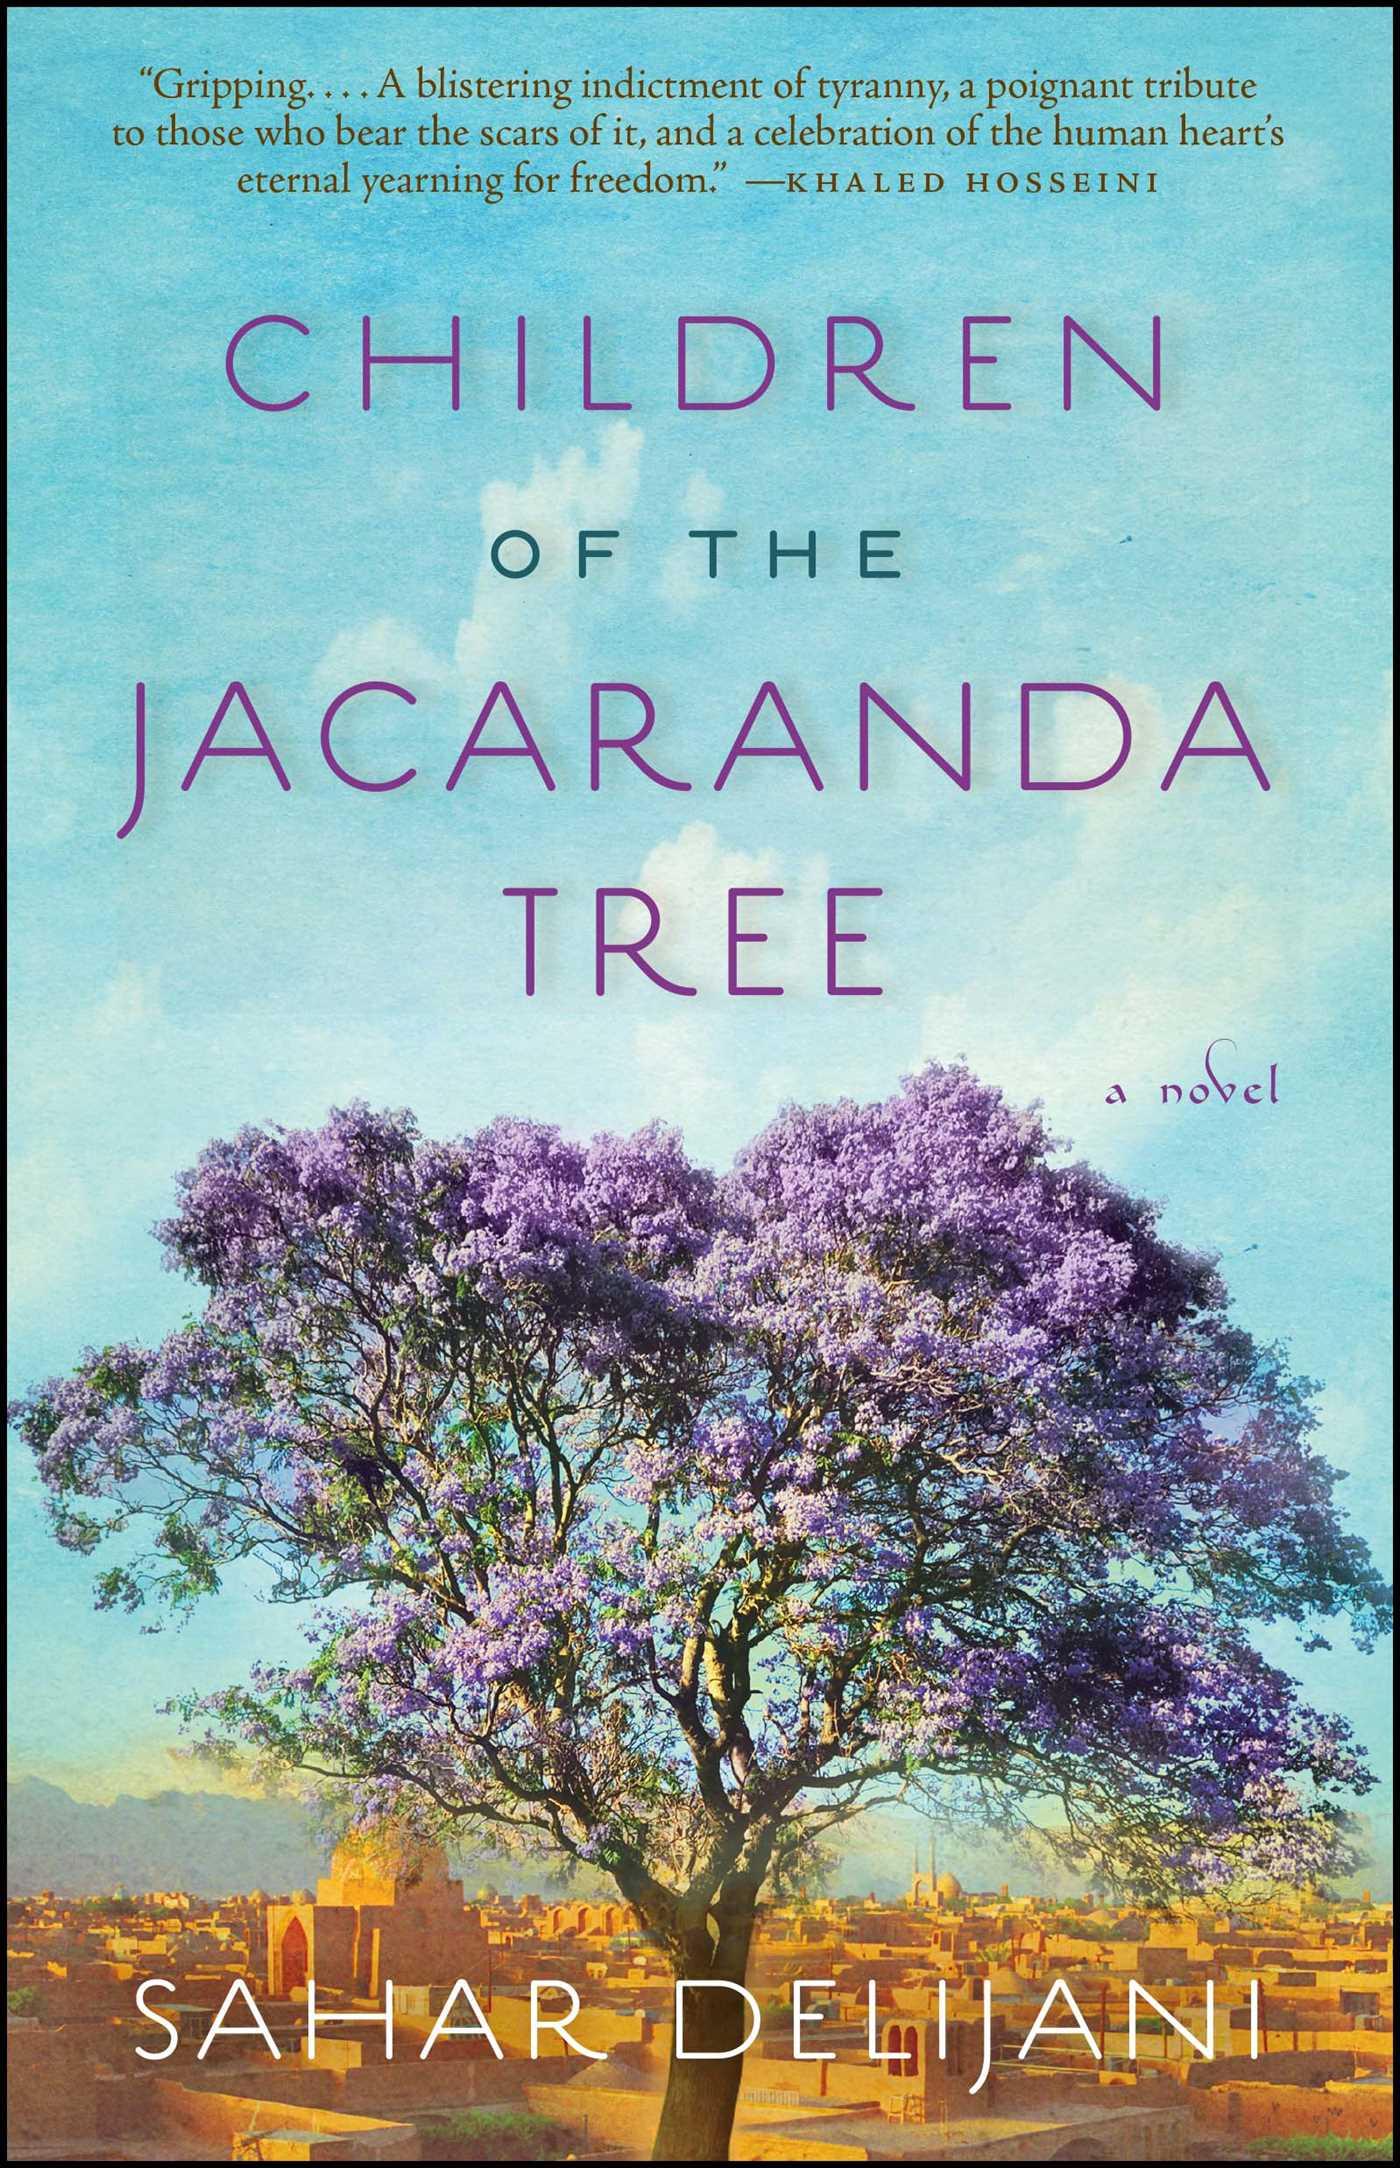 Children of the jacaranda tree 9781476709109 hr